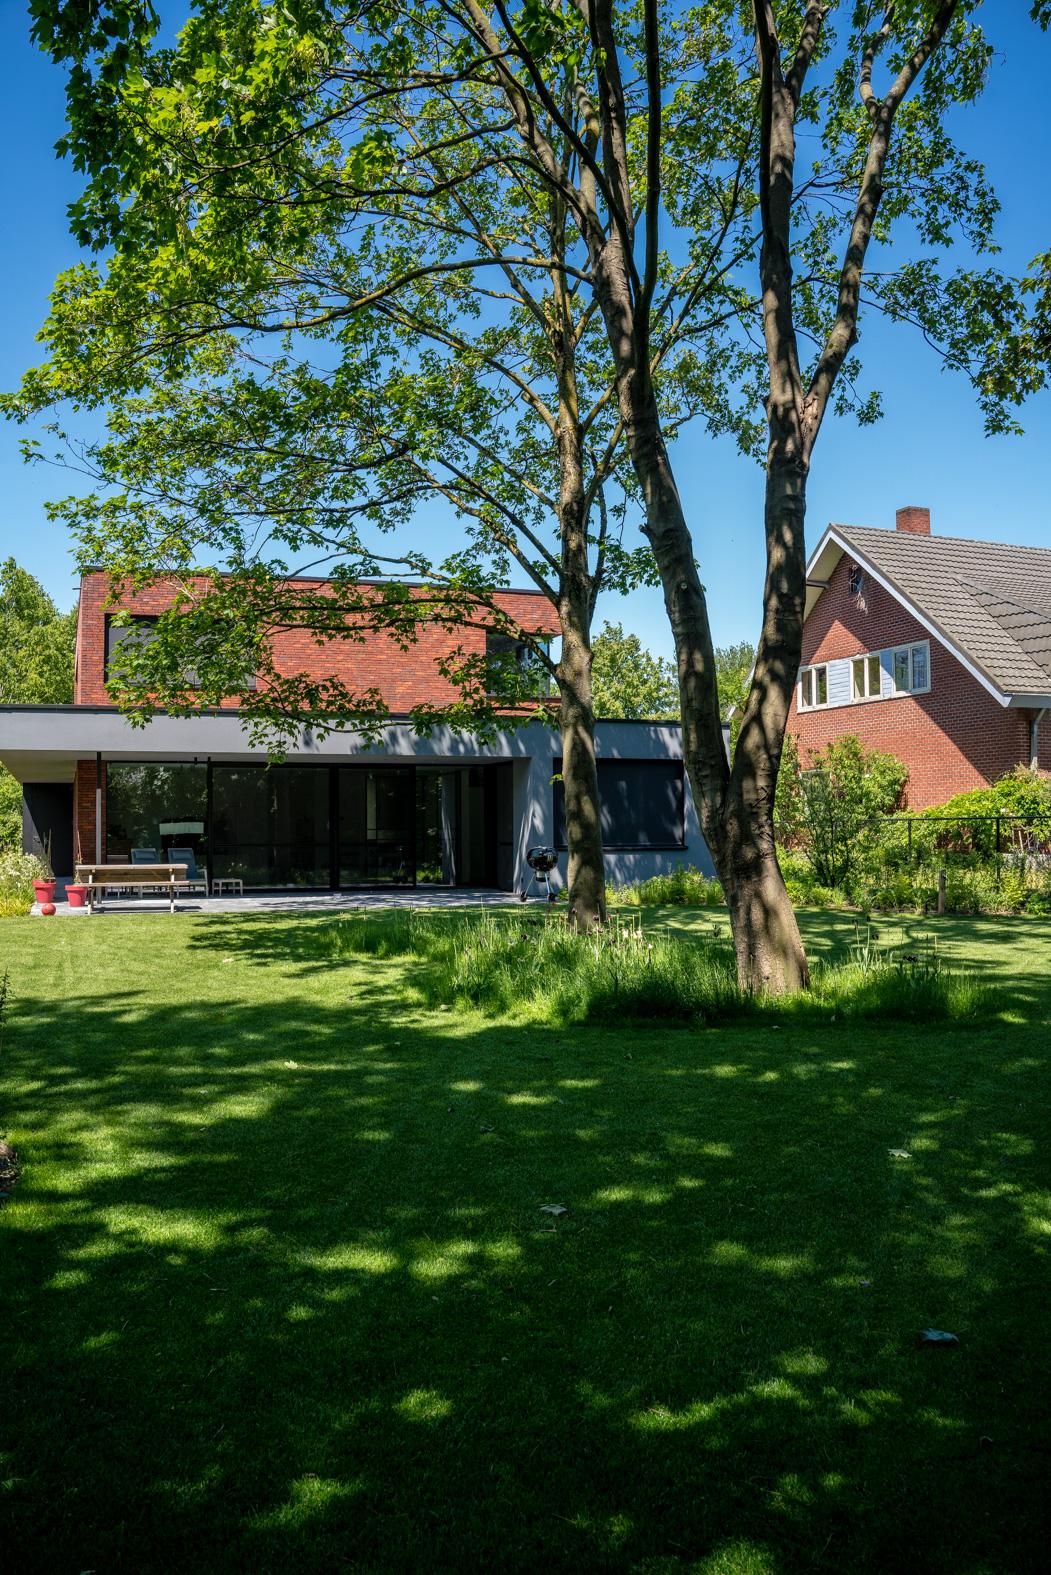 052021 WVV Hogerhuis U665 LOWRES05 | Baeyens & Beck architecten Gent | architect nieuwbouw renovatie interieur | high end | architectenbureau